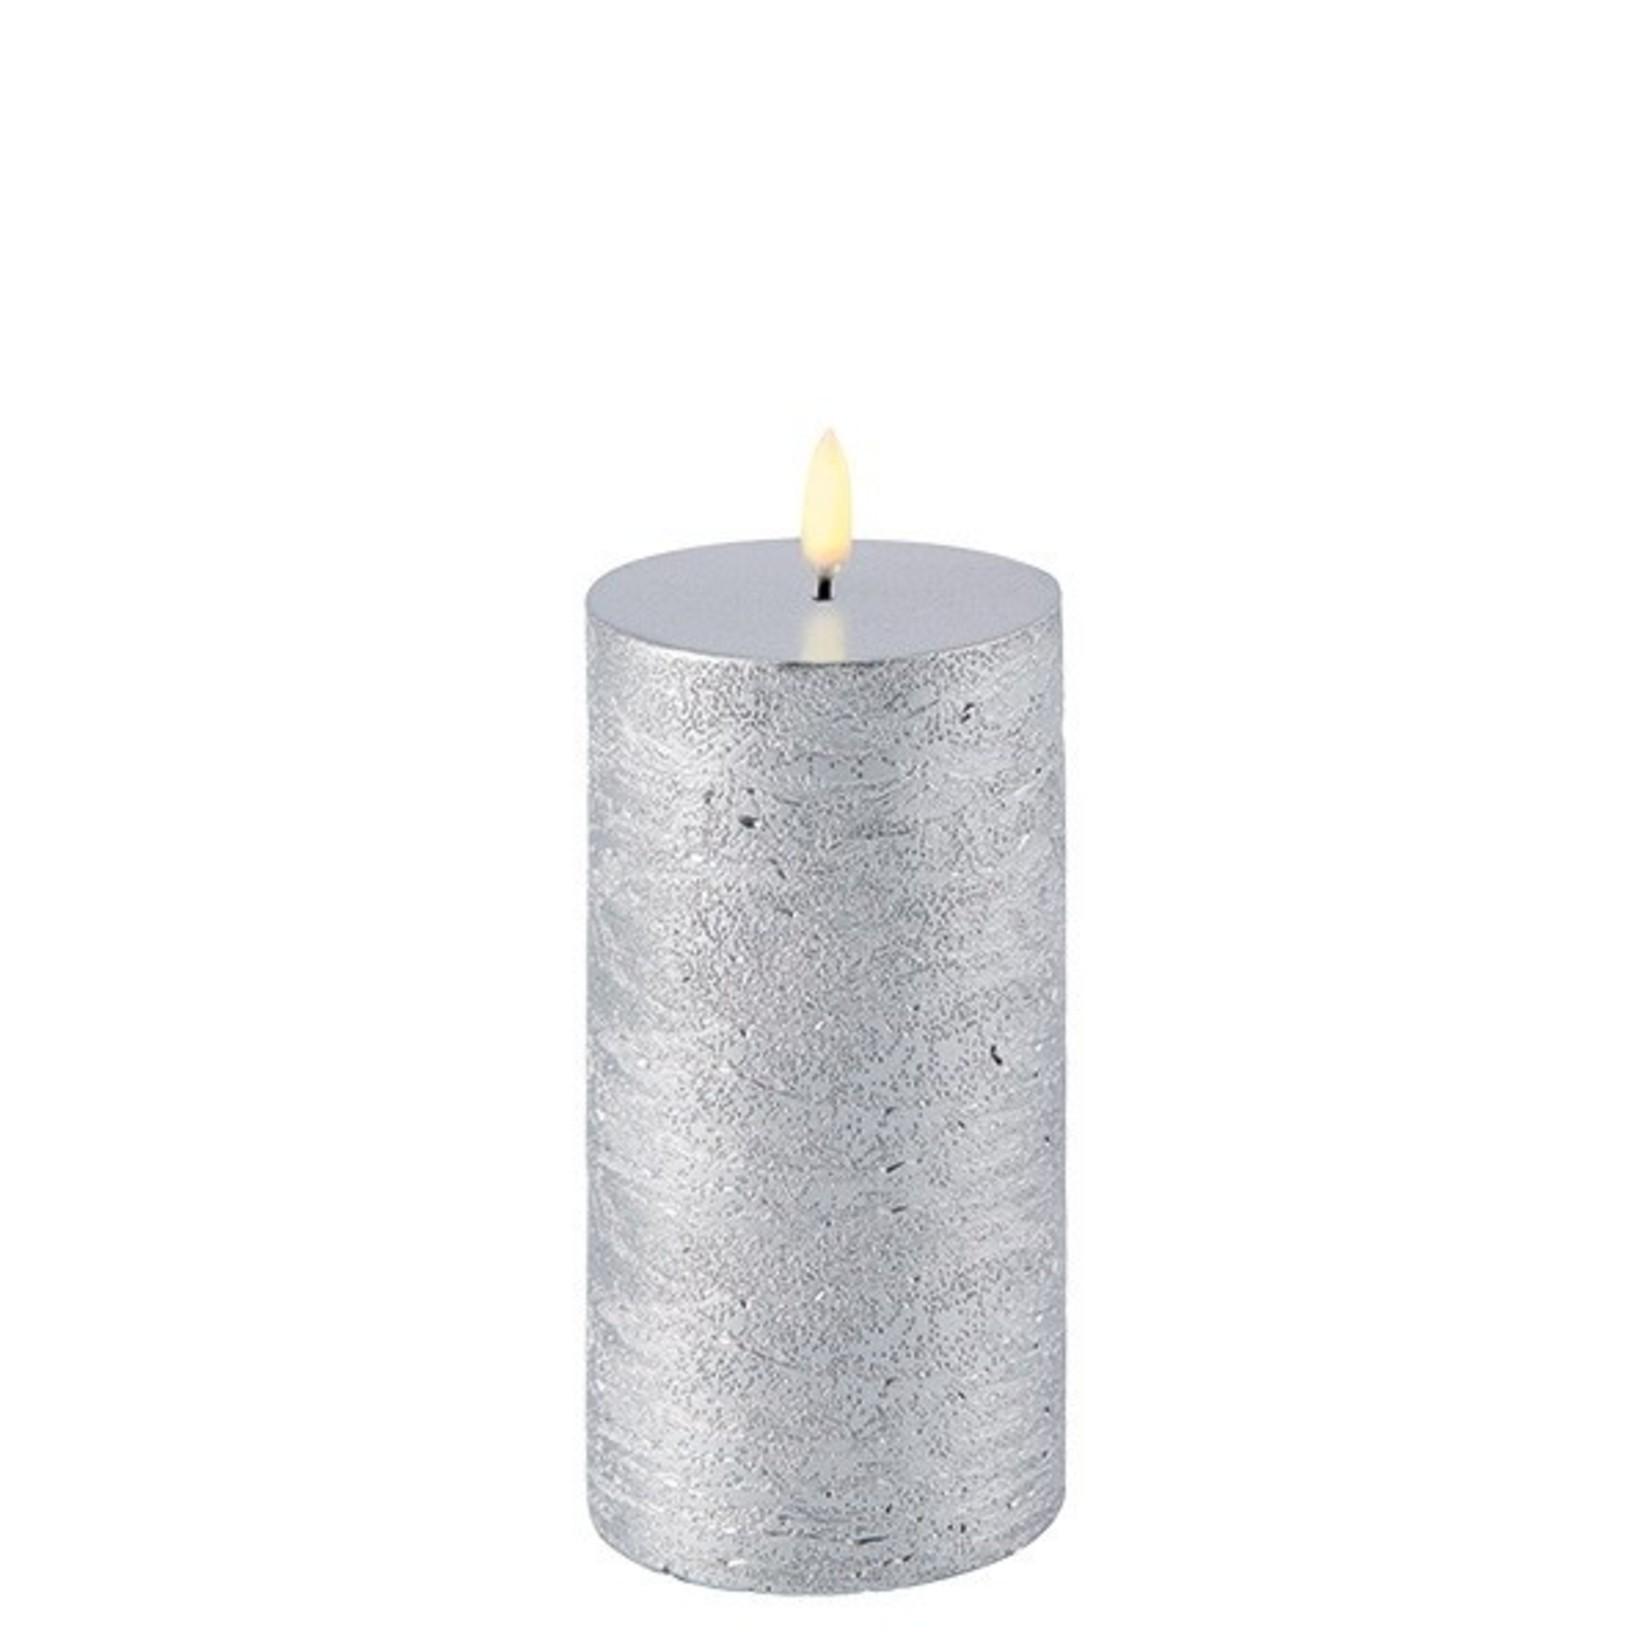 UYUNI LIGHTING LED PILLAR CANDLE - METALLIC SILVER - Ø7,8 x 15 CM